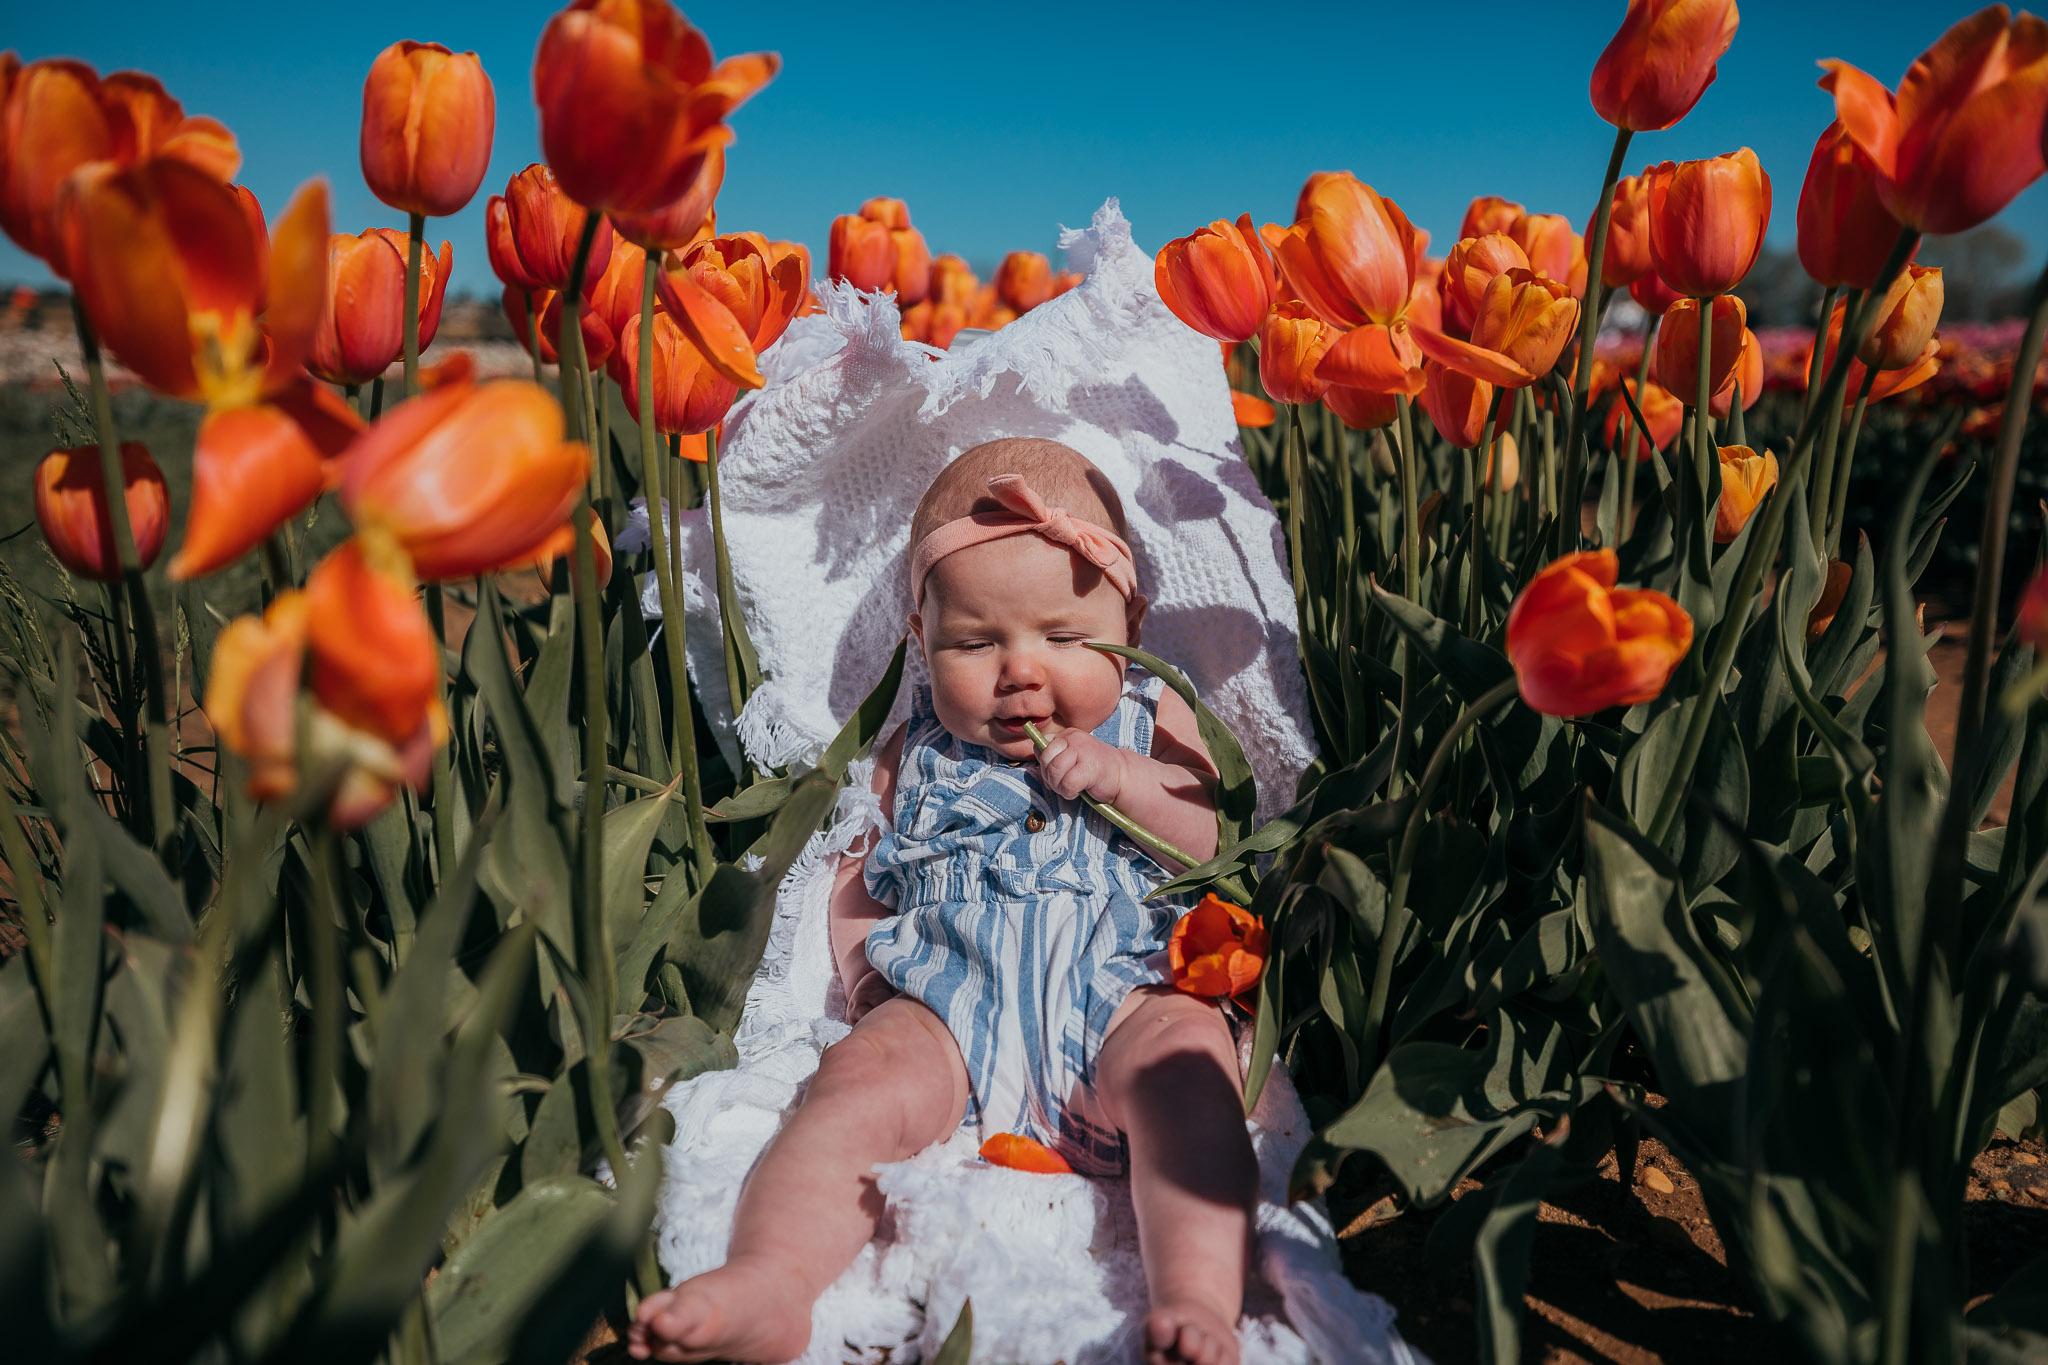 Tulips-4466.jpg